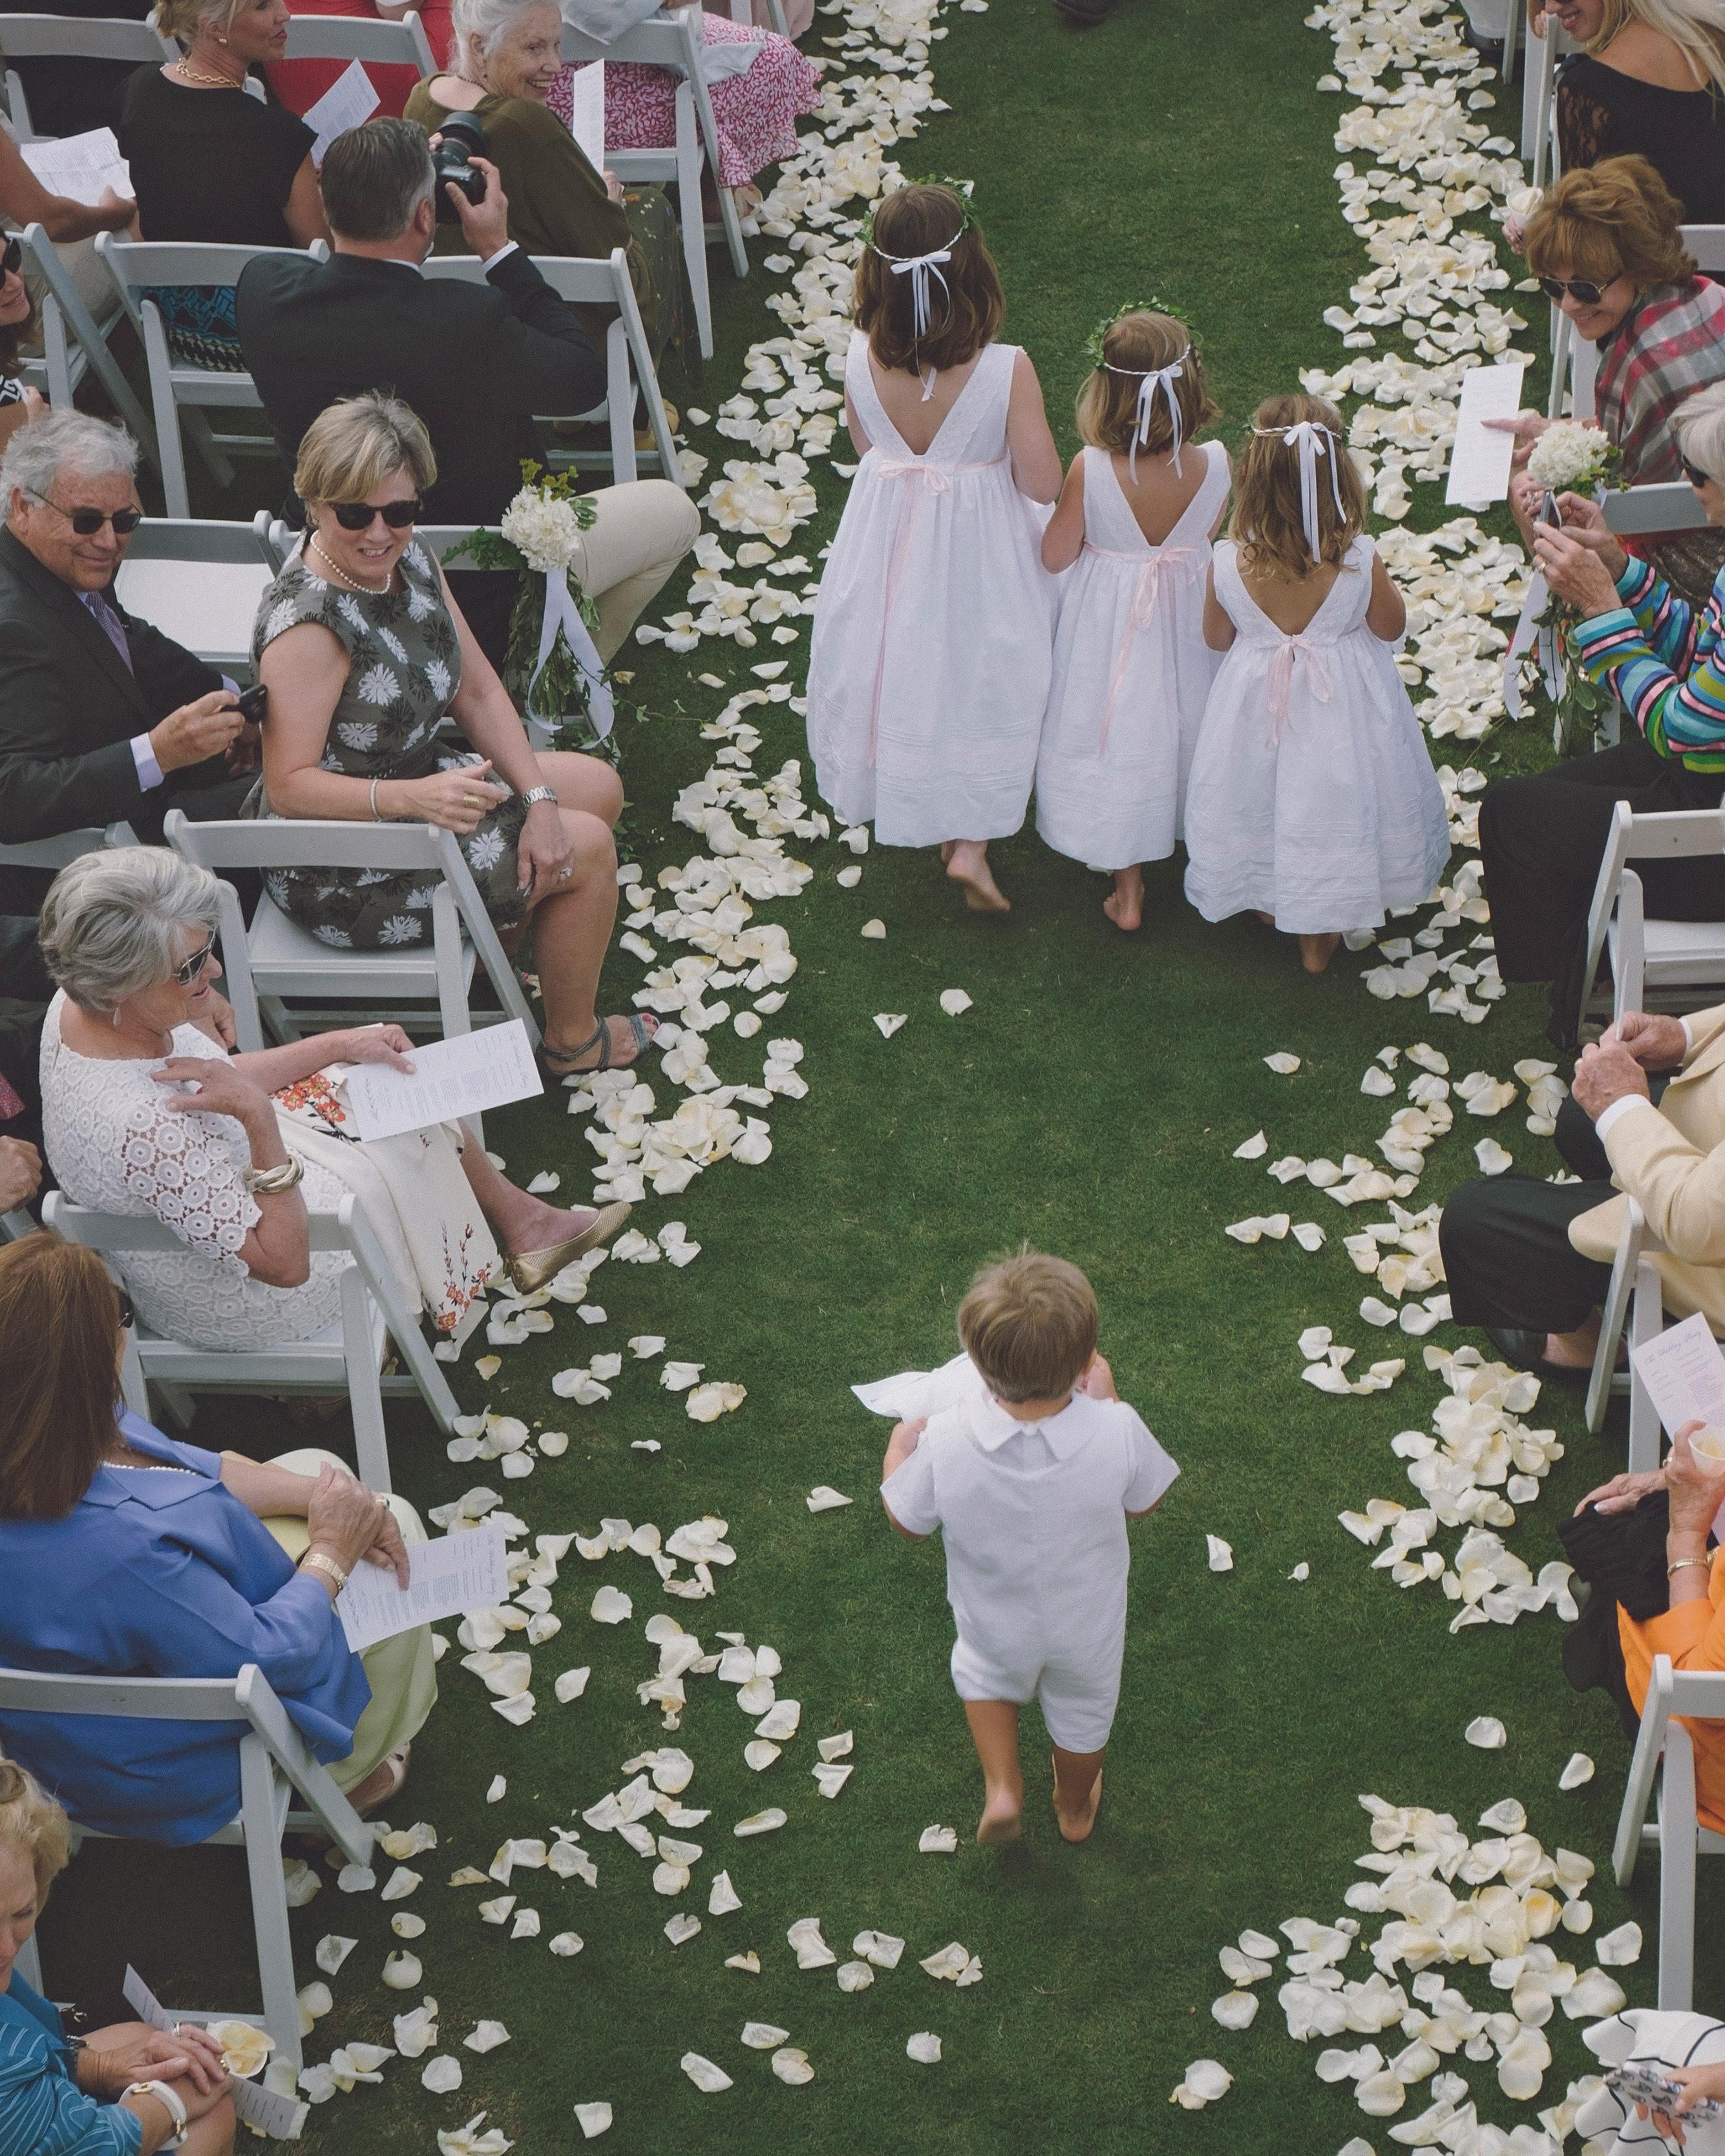 molly-greg-wedding-kids-005-s111481-0814.jpg